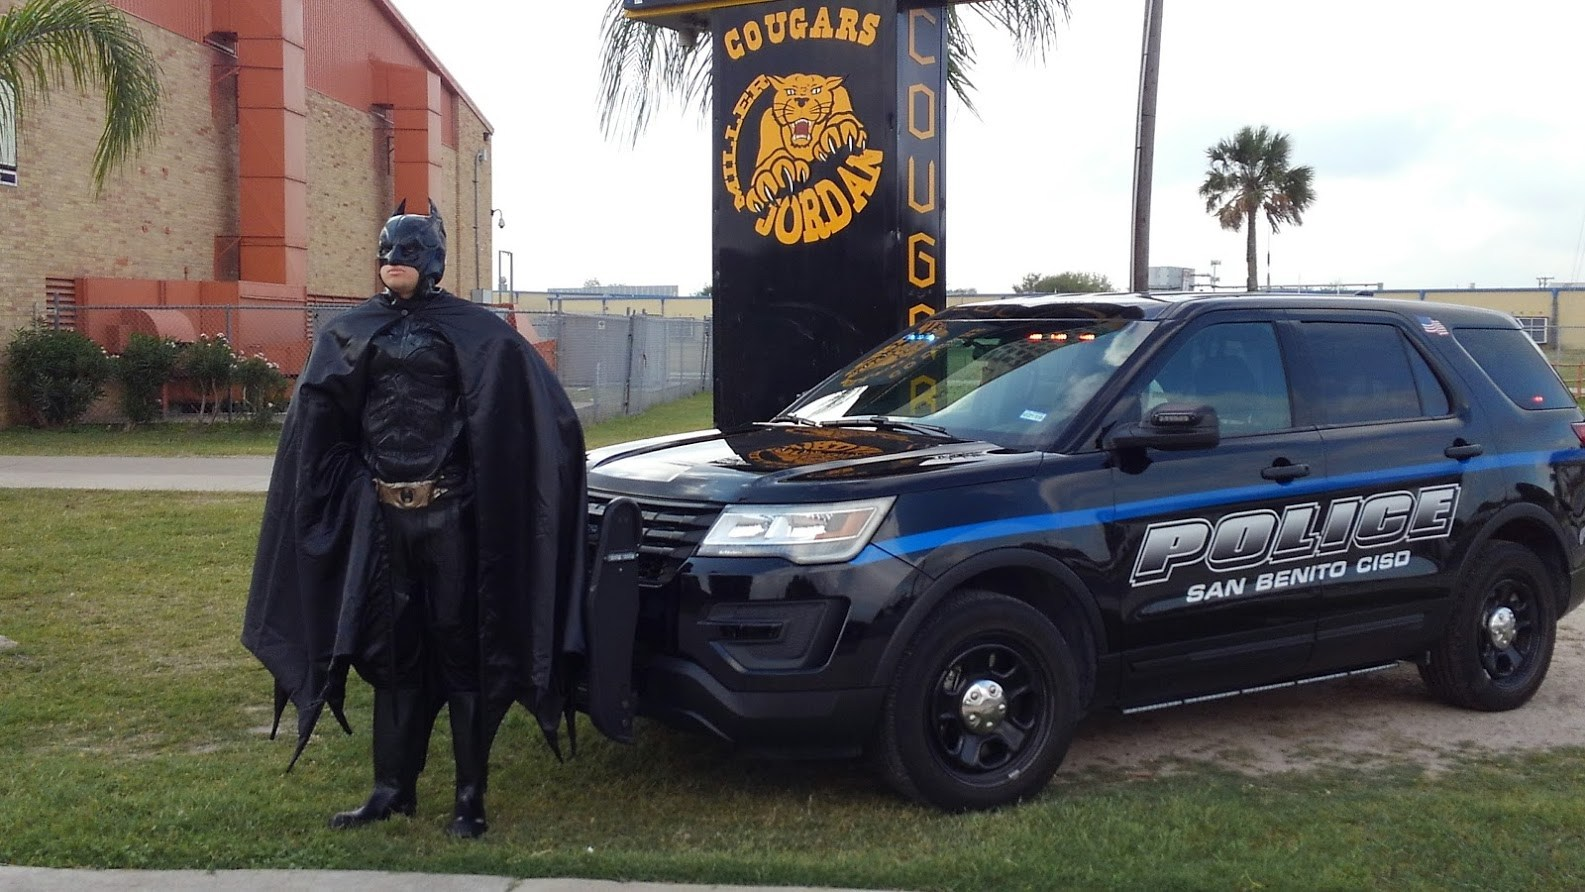 Batman Miller Jordan